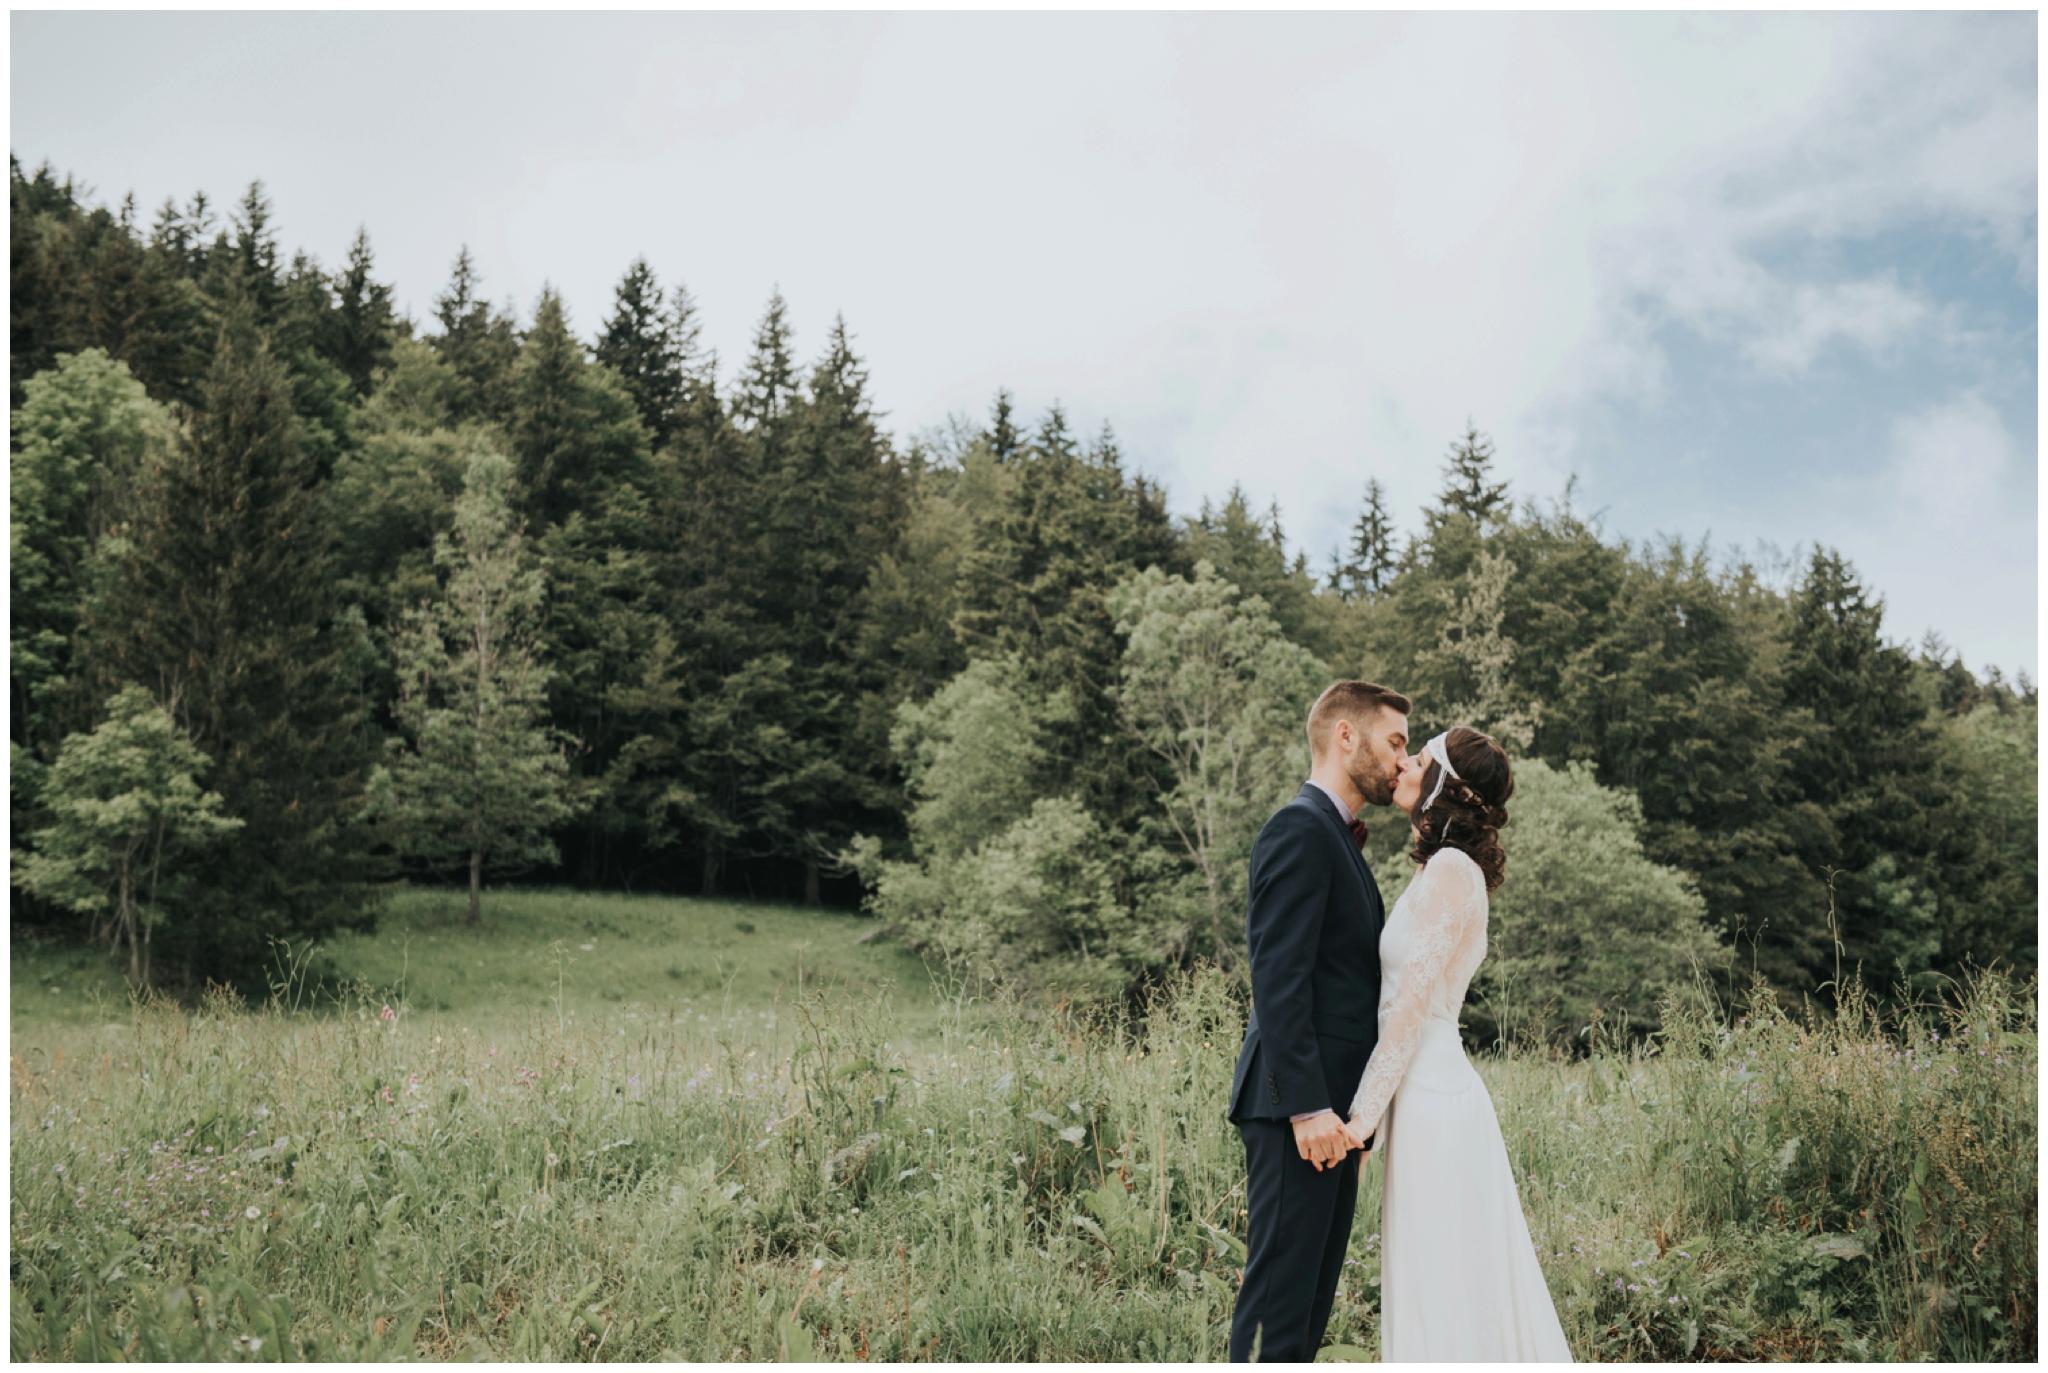 photographe-mariage-montagne-vercors-boho-folk-grenoble-annecy-alpes_0036